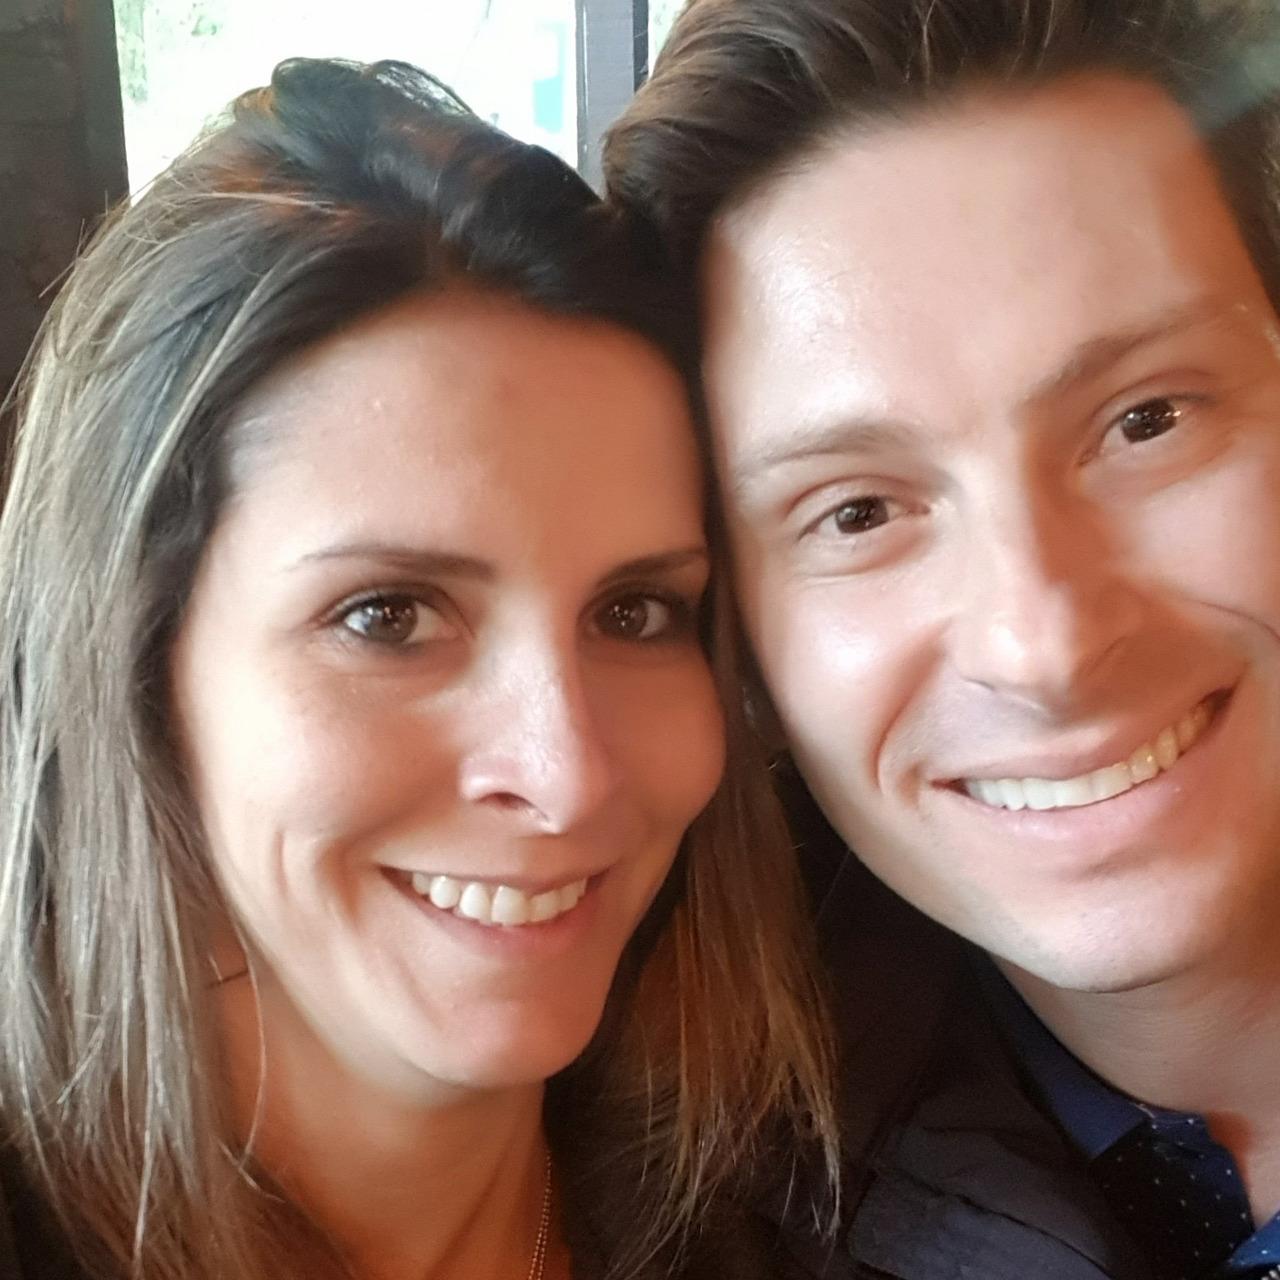 Site ul gratuit de dating in Montreal caut amant kula